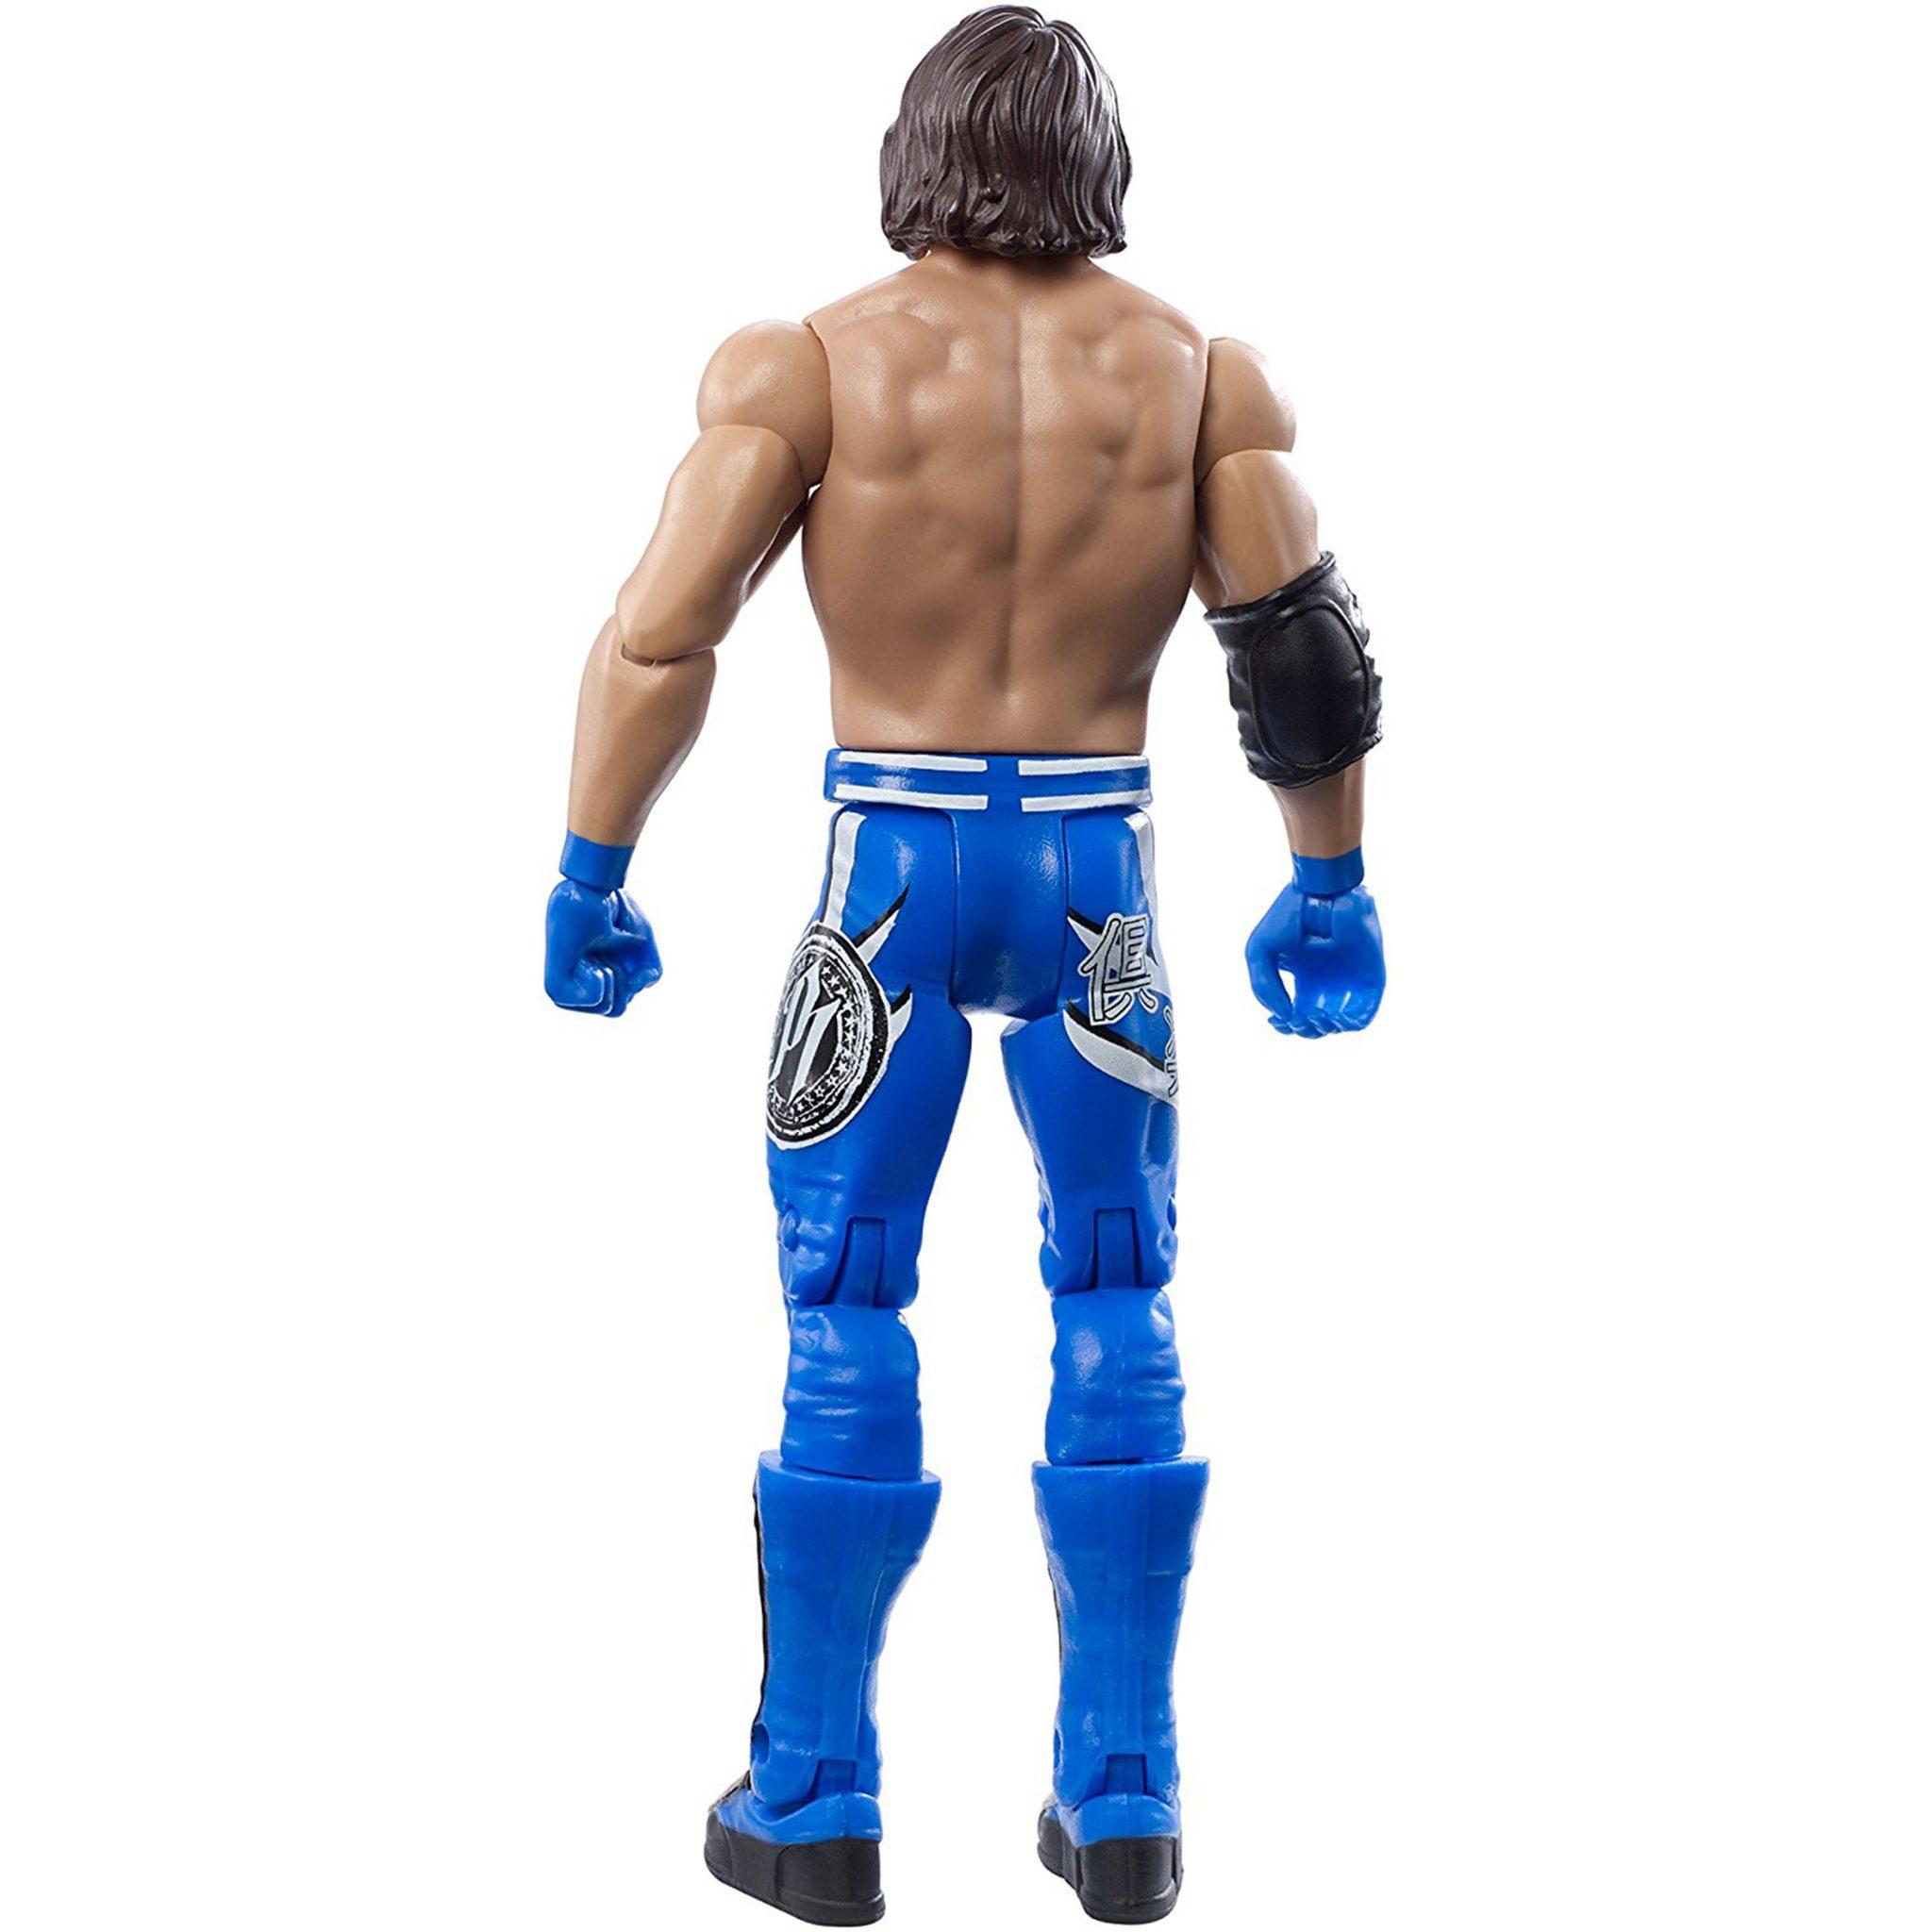 WWE ACTION FIGURE SERIES 76 AJ STYLES